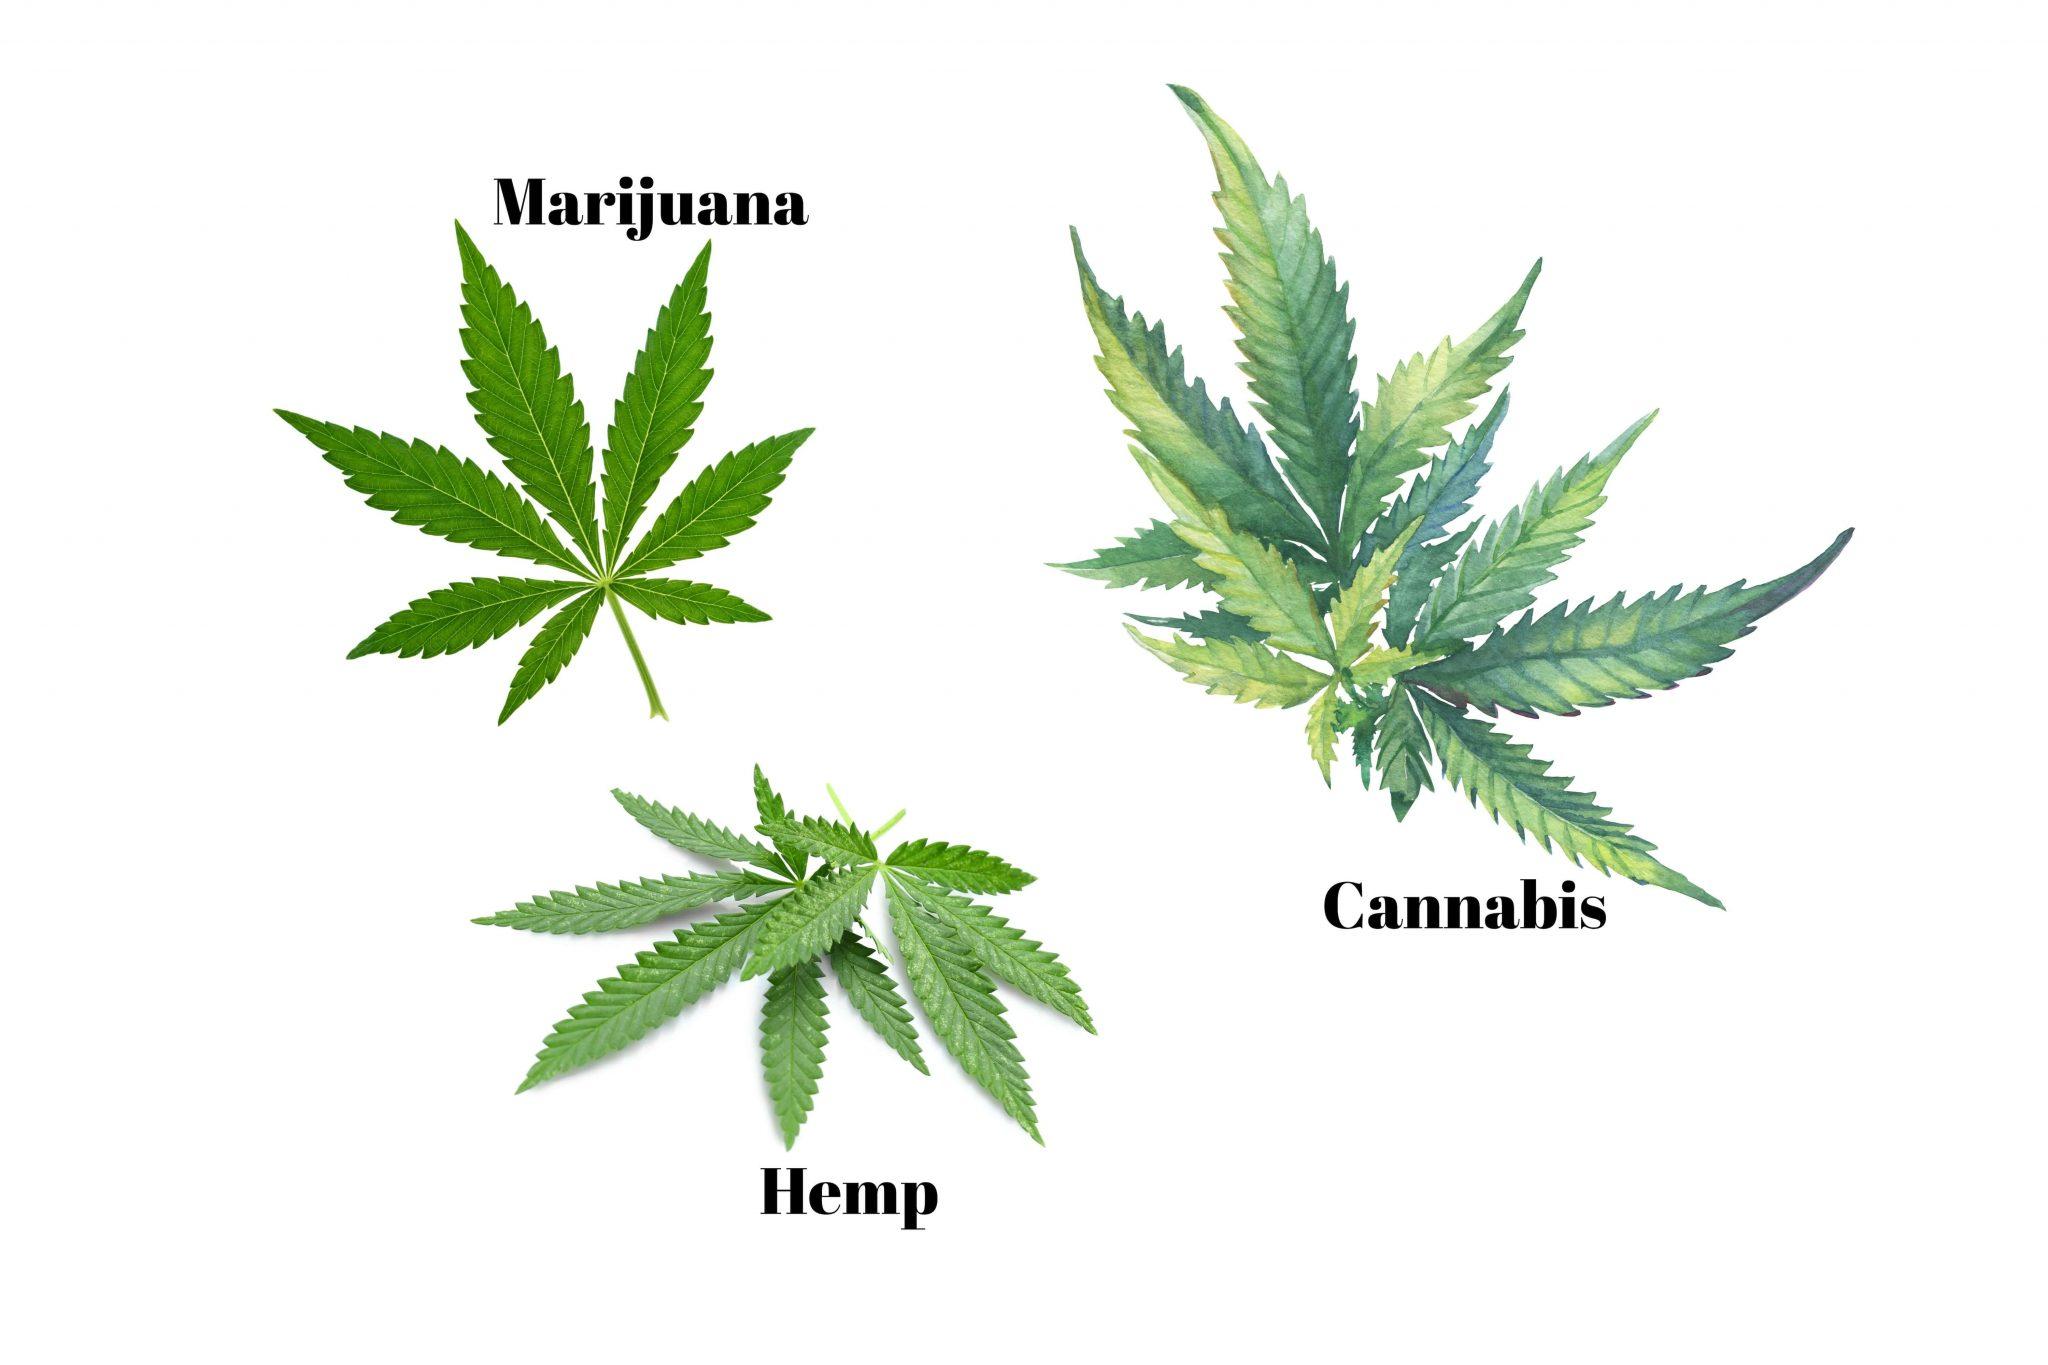 Cannabis vs Marijuana vs Hemp. What exactly is the difference?